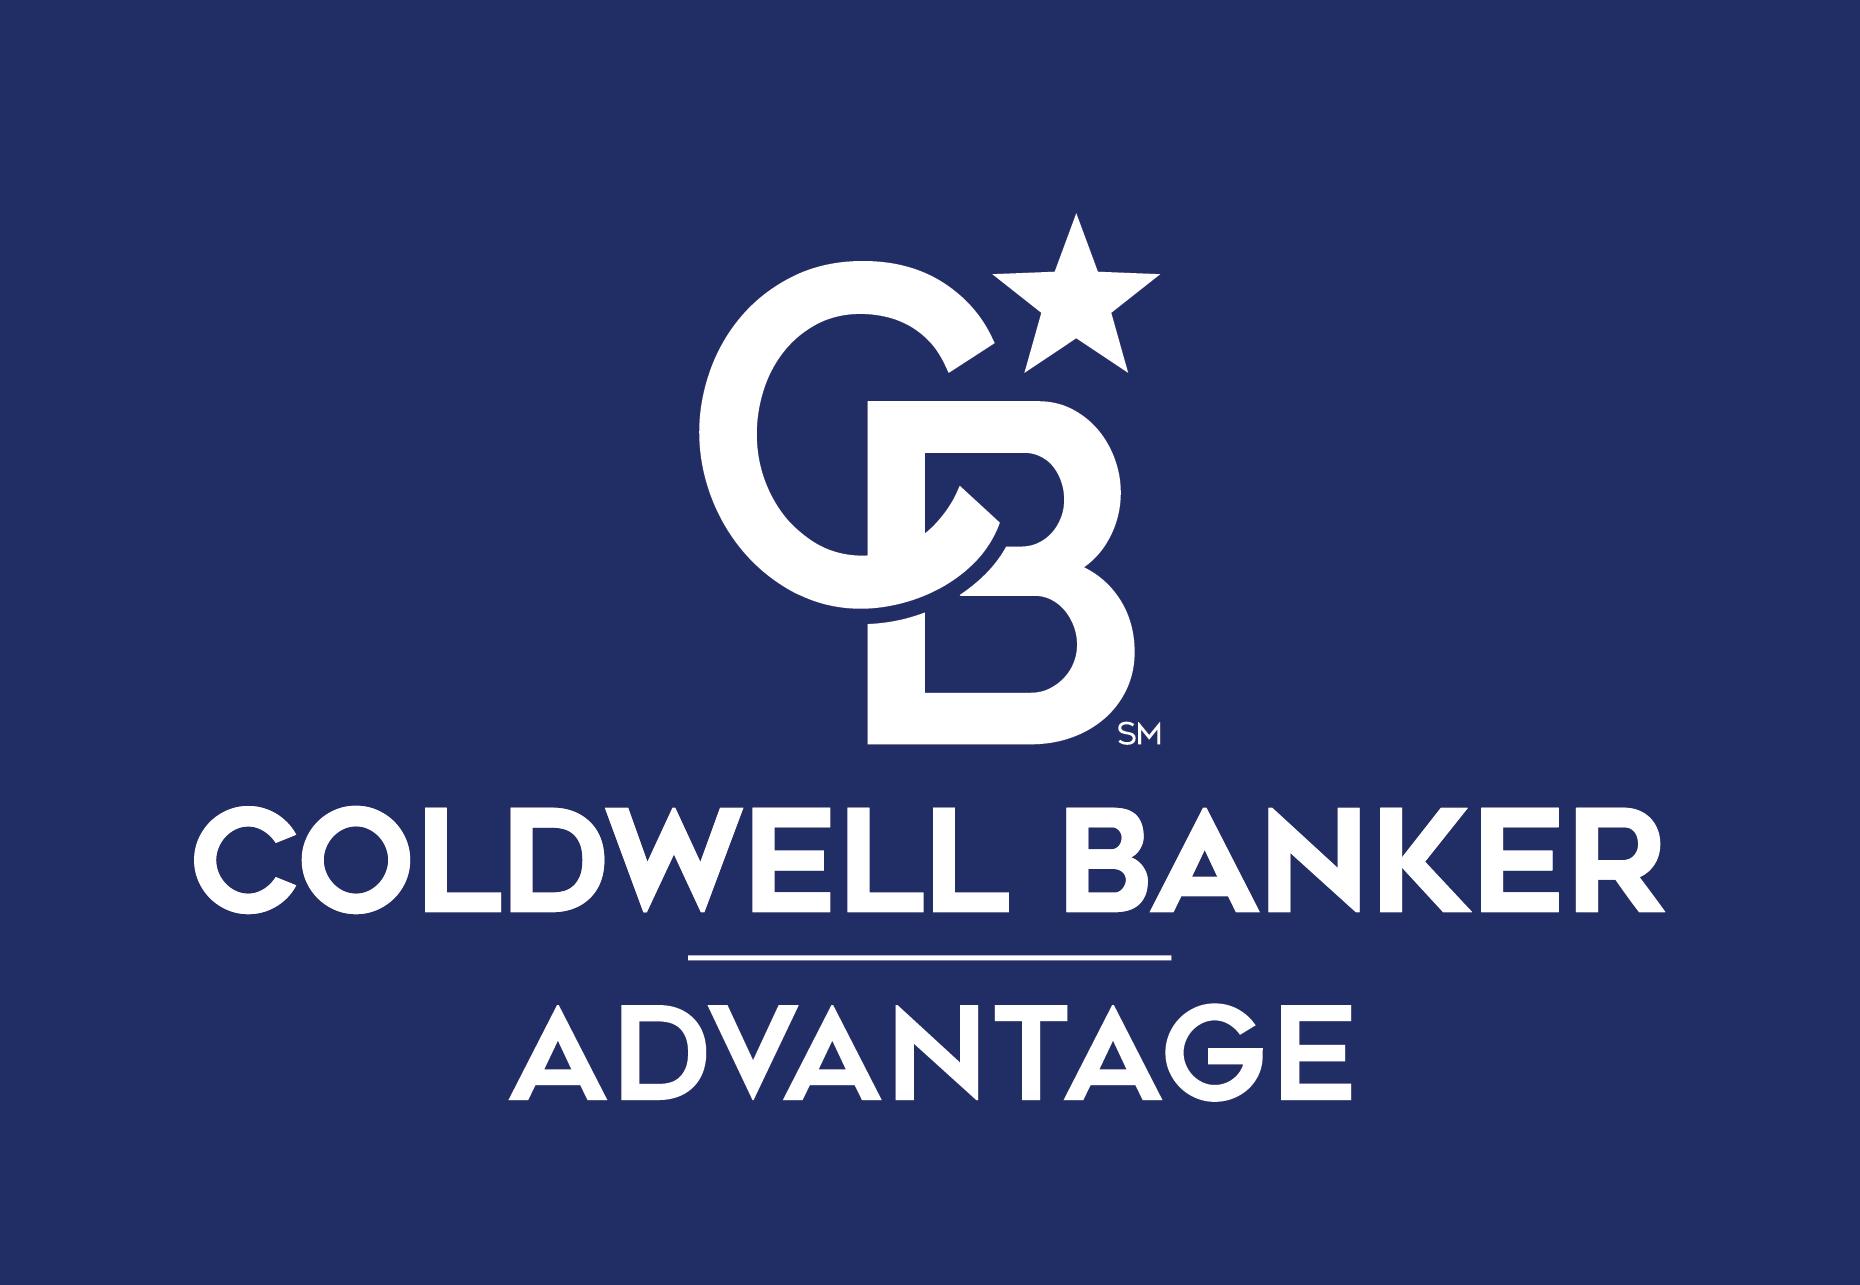 Joshua Paul - Coldwell Banker Advantage Logo